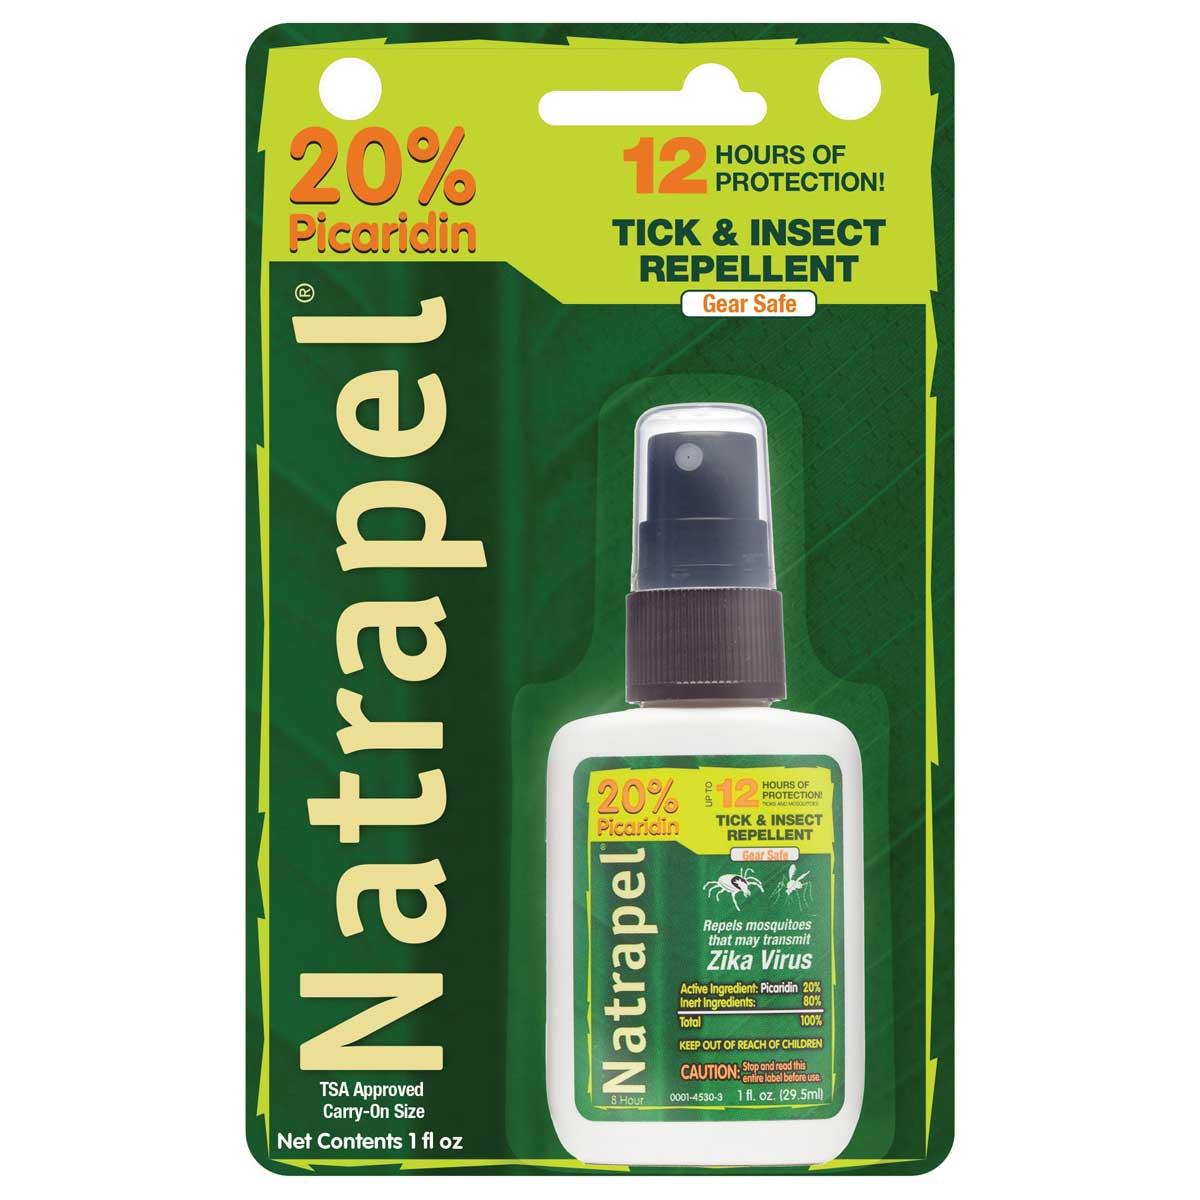 Tick & Insect Repellent Pump Spray